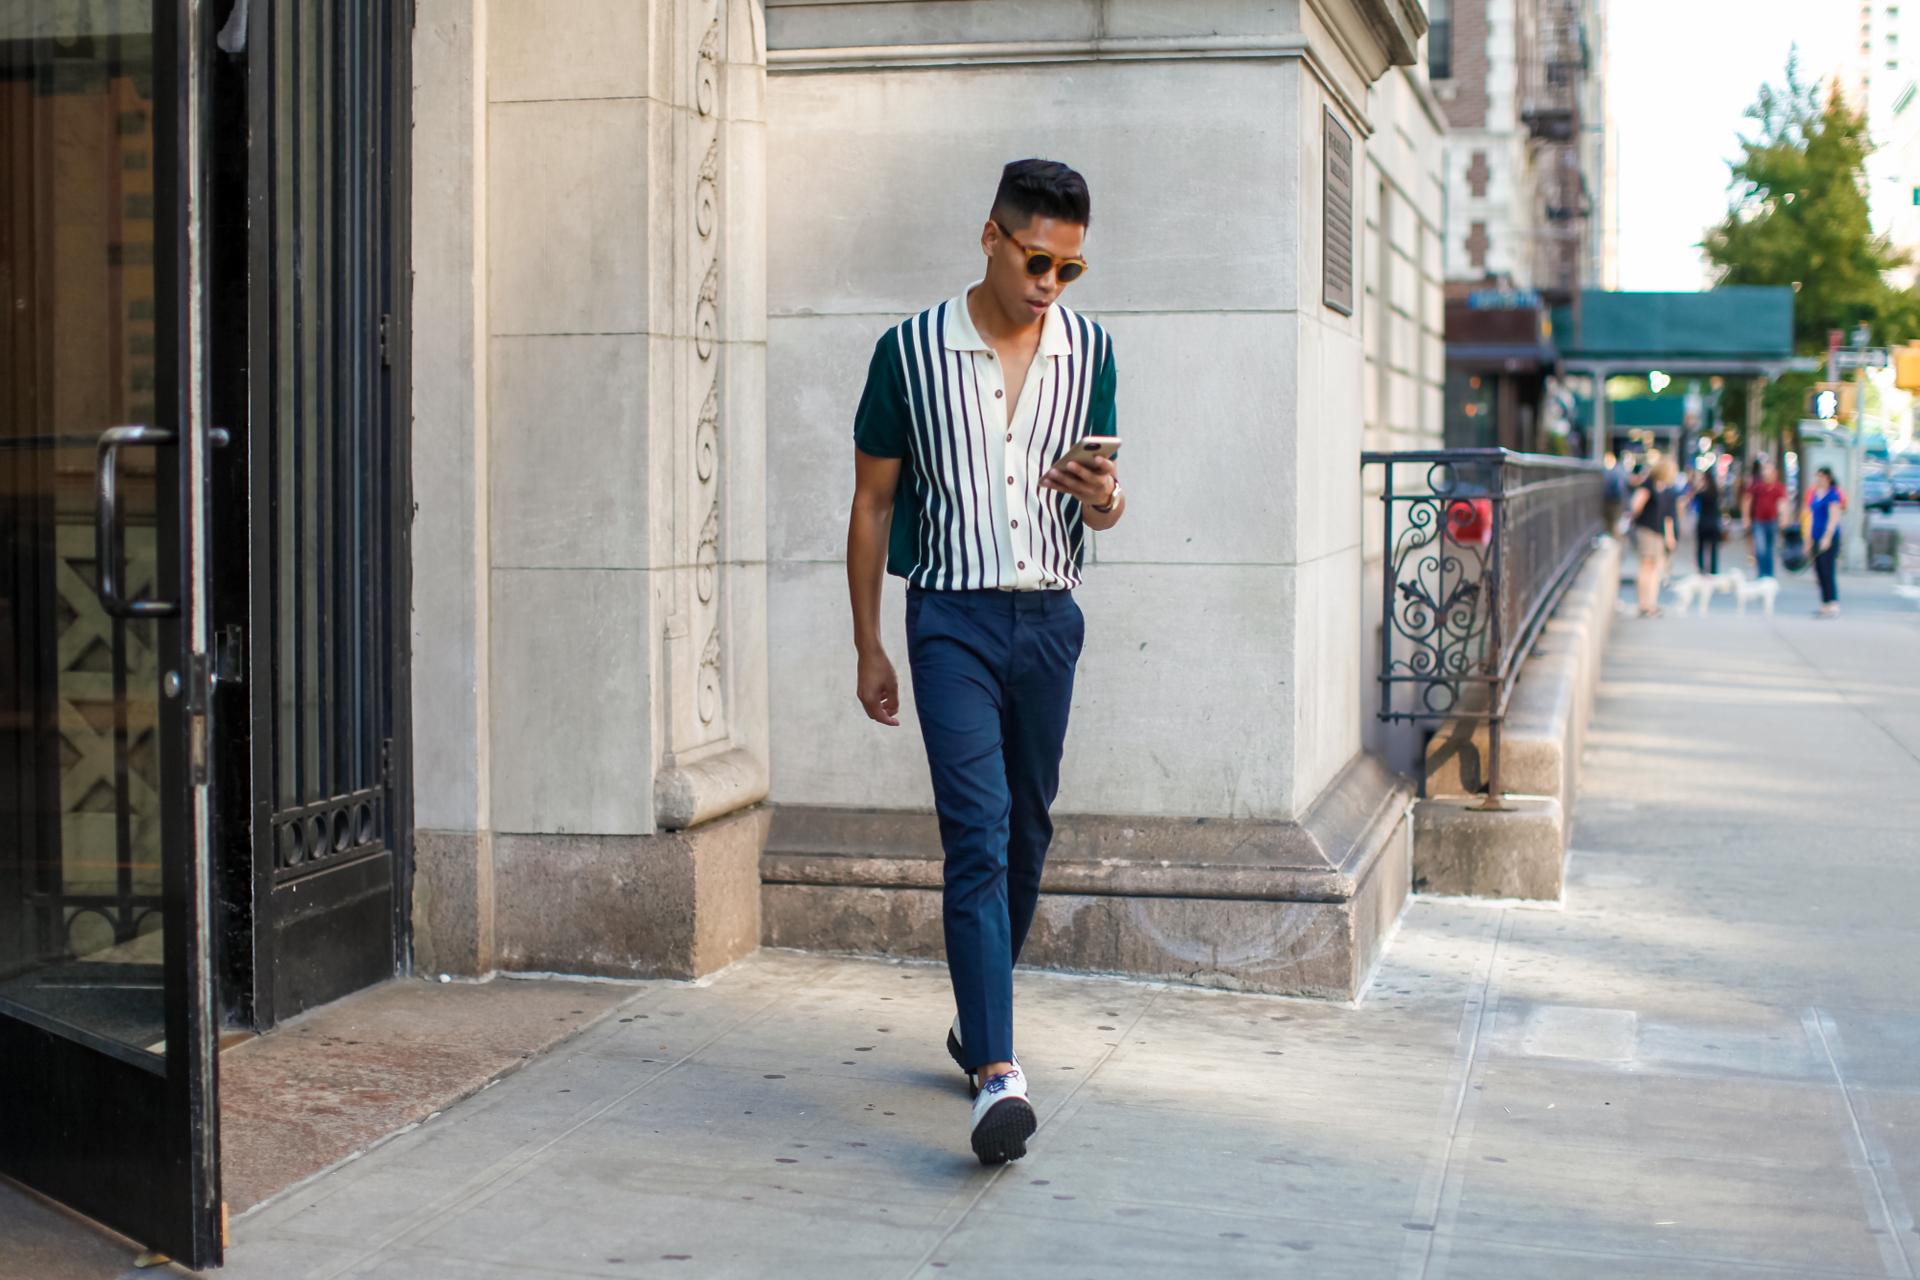 oh anthonio - Anthony Urbano - David Hart striped polo shirt NYFWM street style